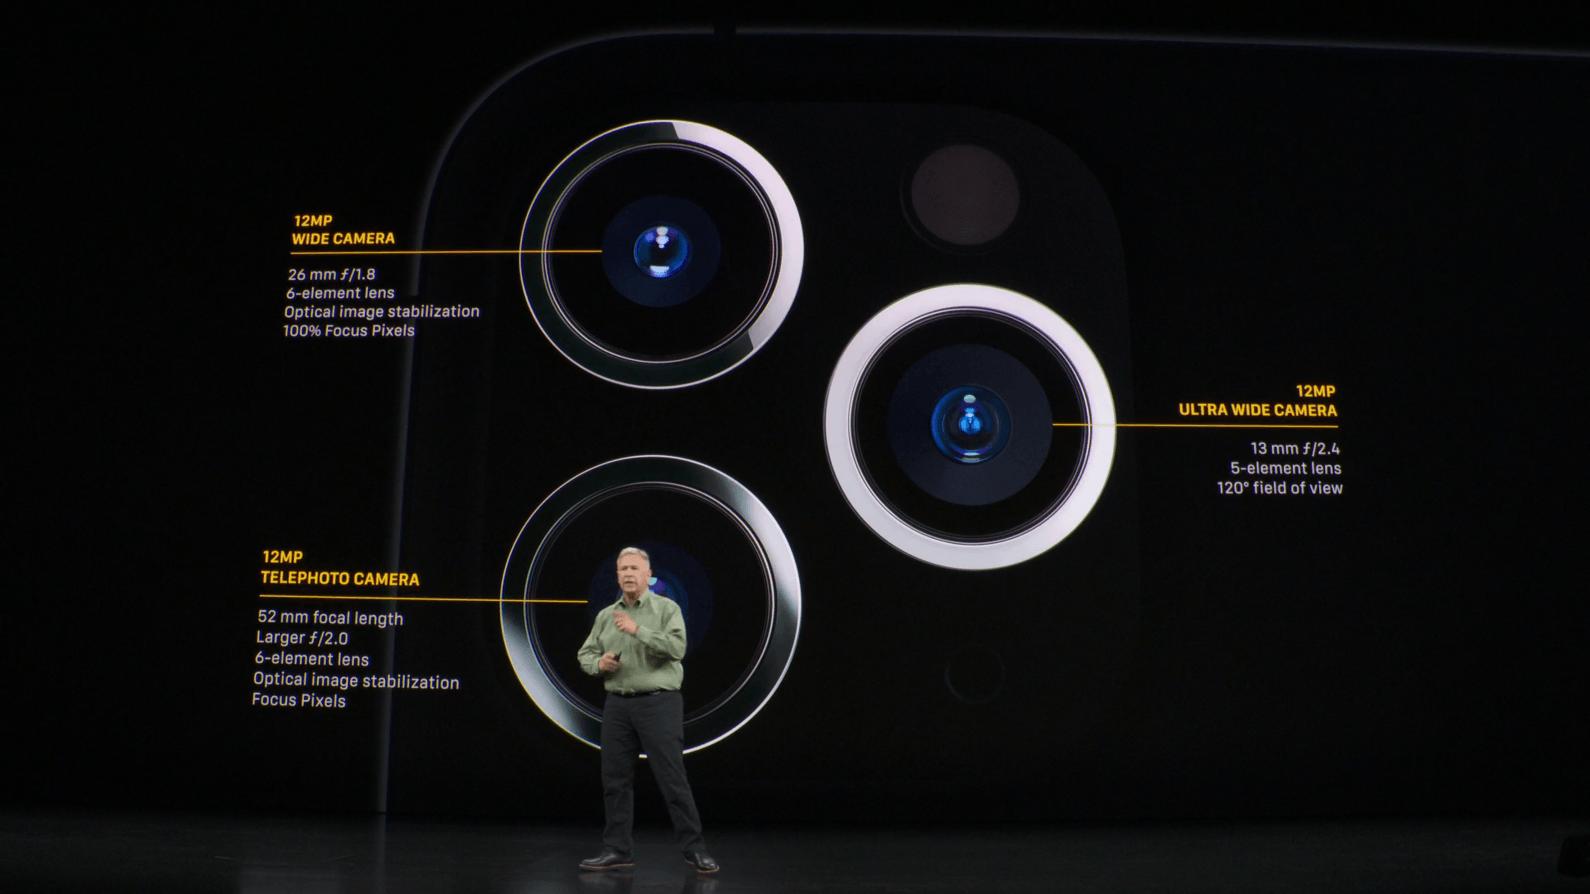 iphone 11 pro 3 cameras